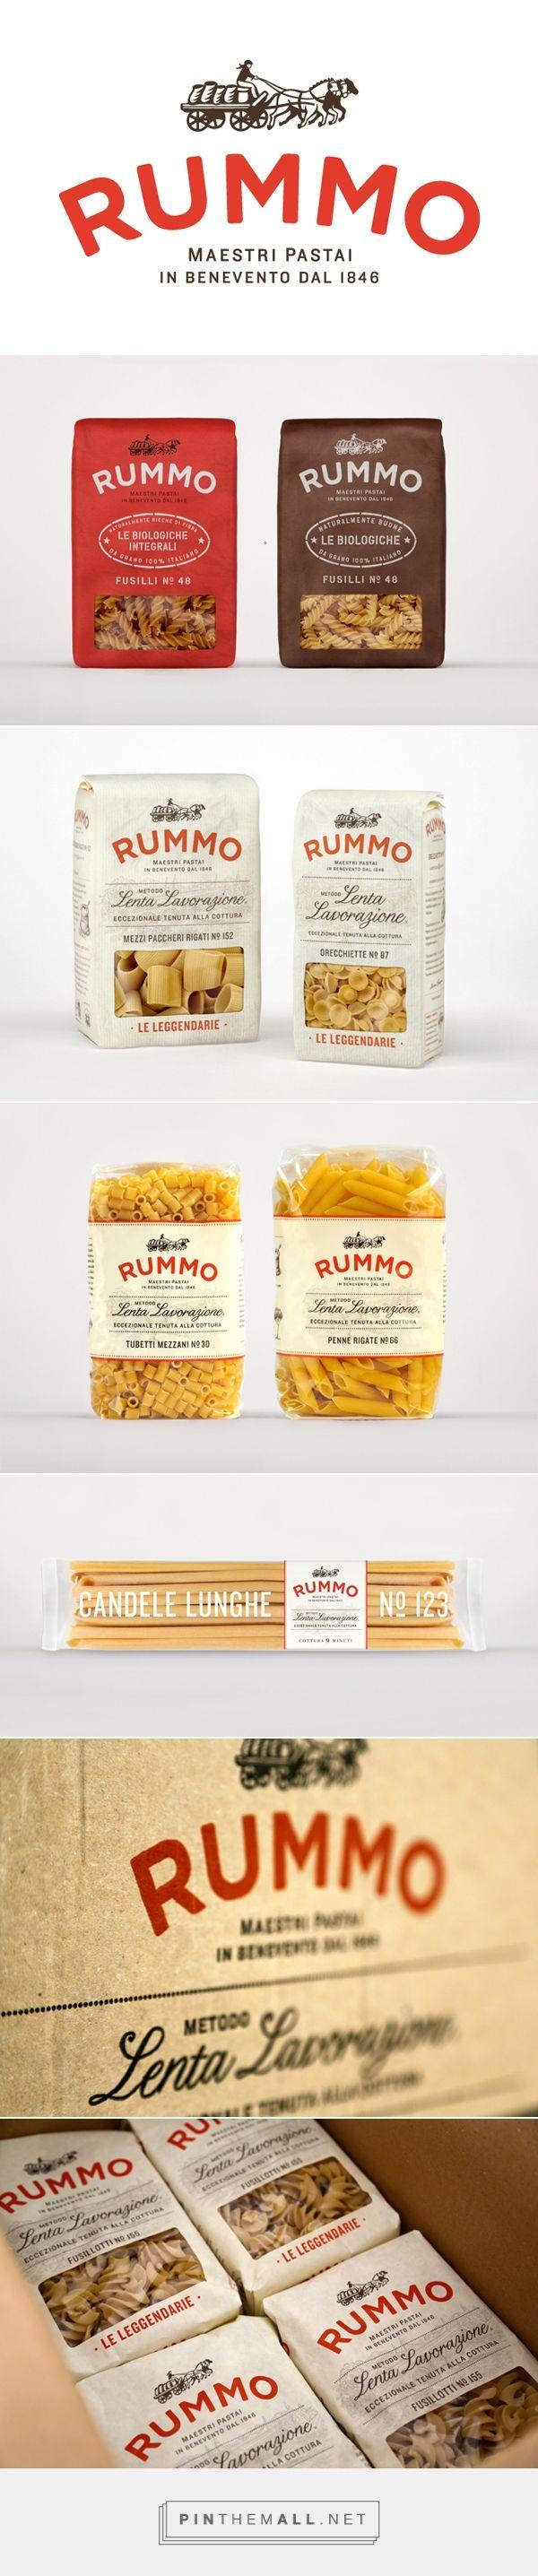 Rummo - Italian pasta packaging designArt and design inspiration from around the world – CreativeRoots